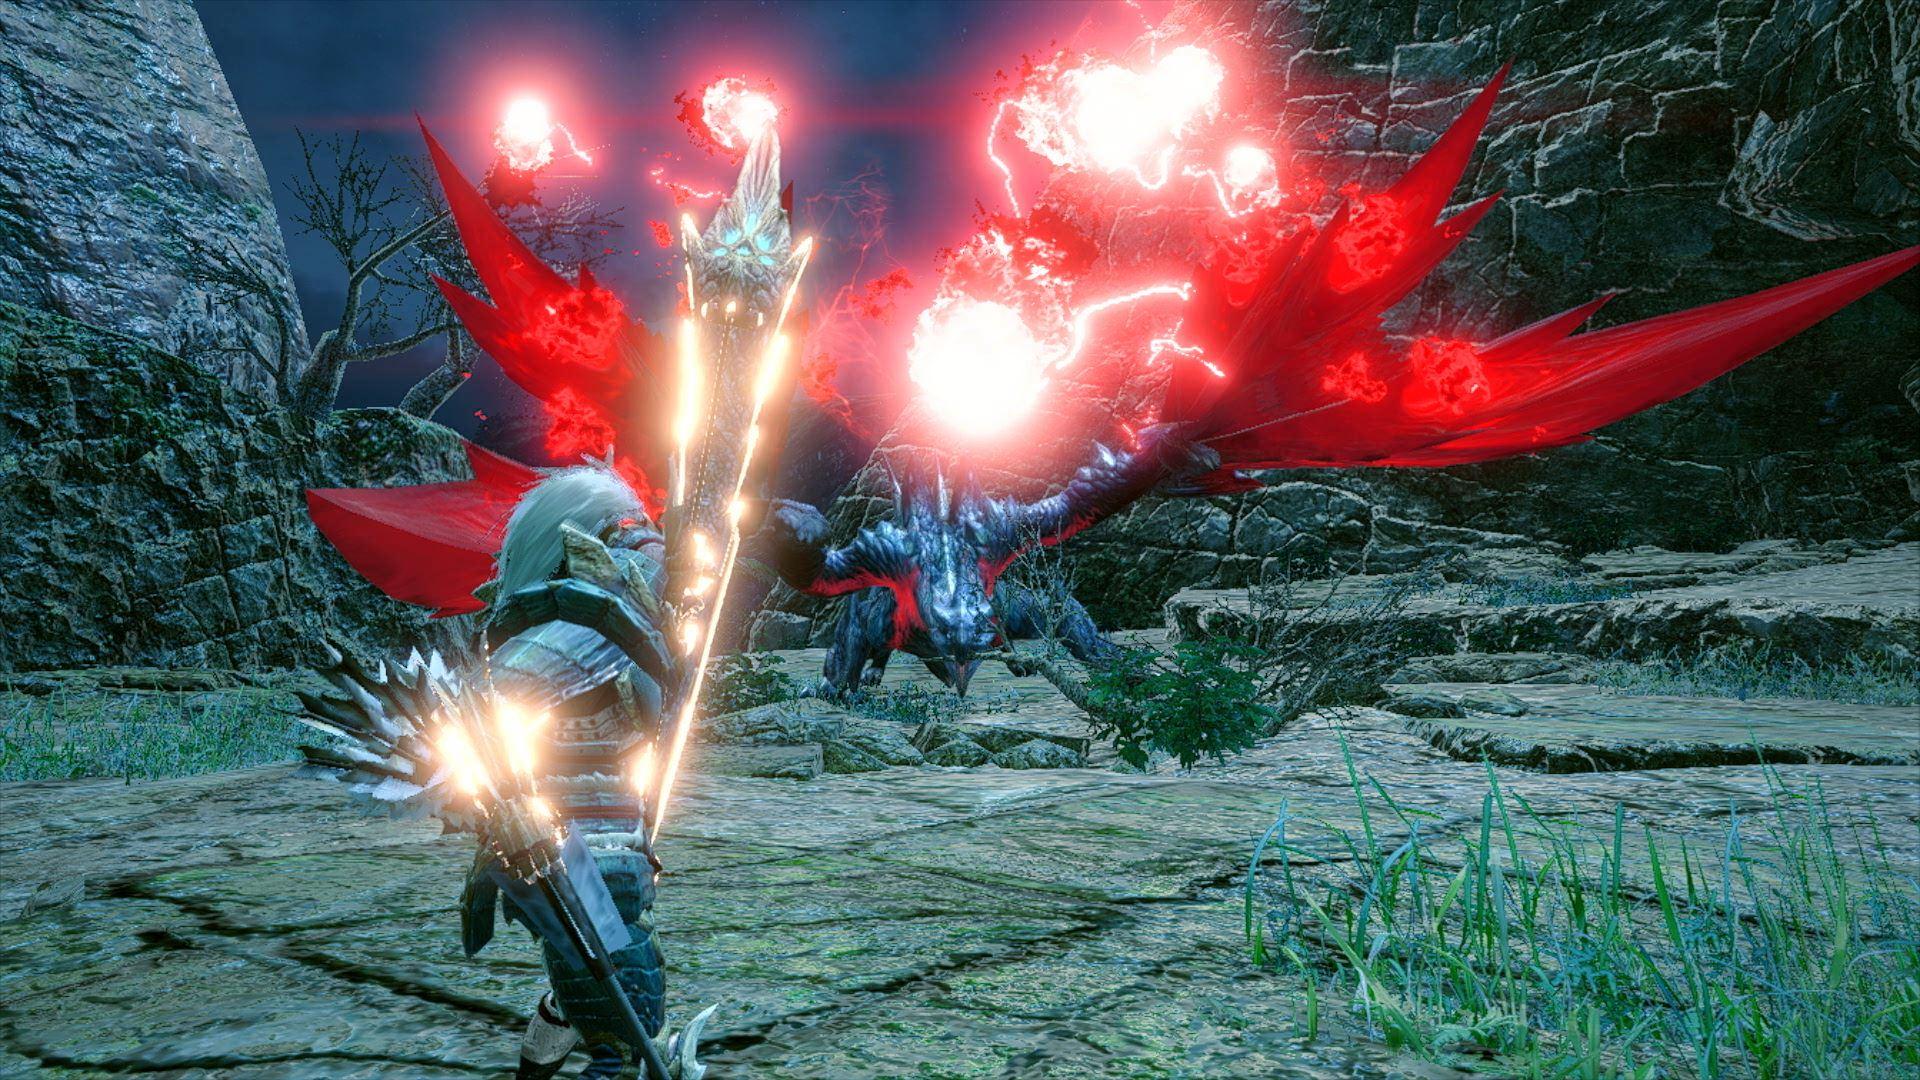 Screenshot From Monster Hunter Rise Featuring Crimson Glow Valstrax